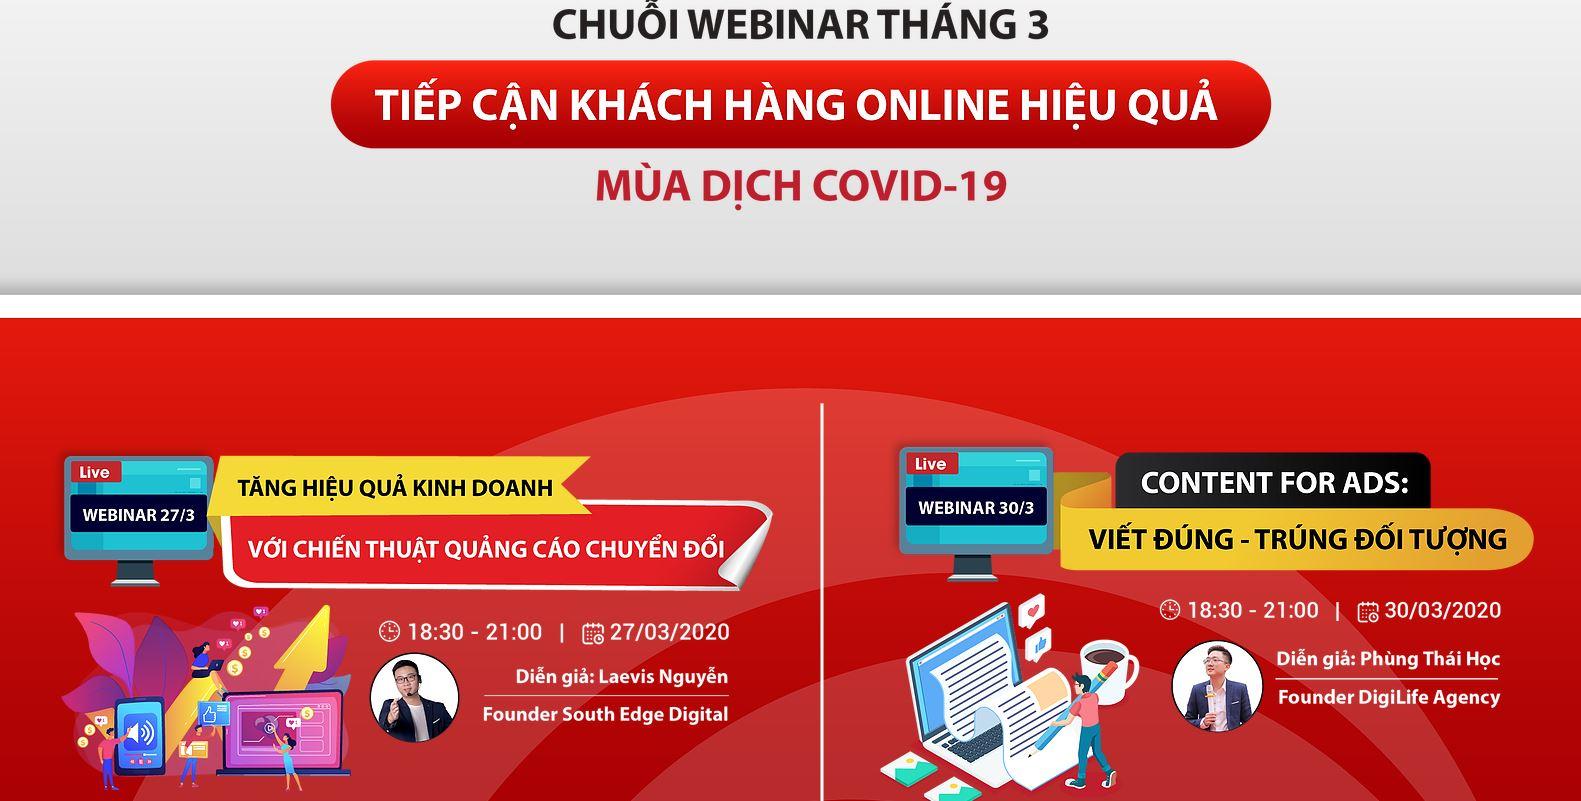 chuoi-webinar-thang-3-kinh-doanh-online-mua-covid-19